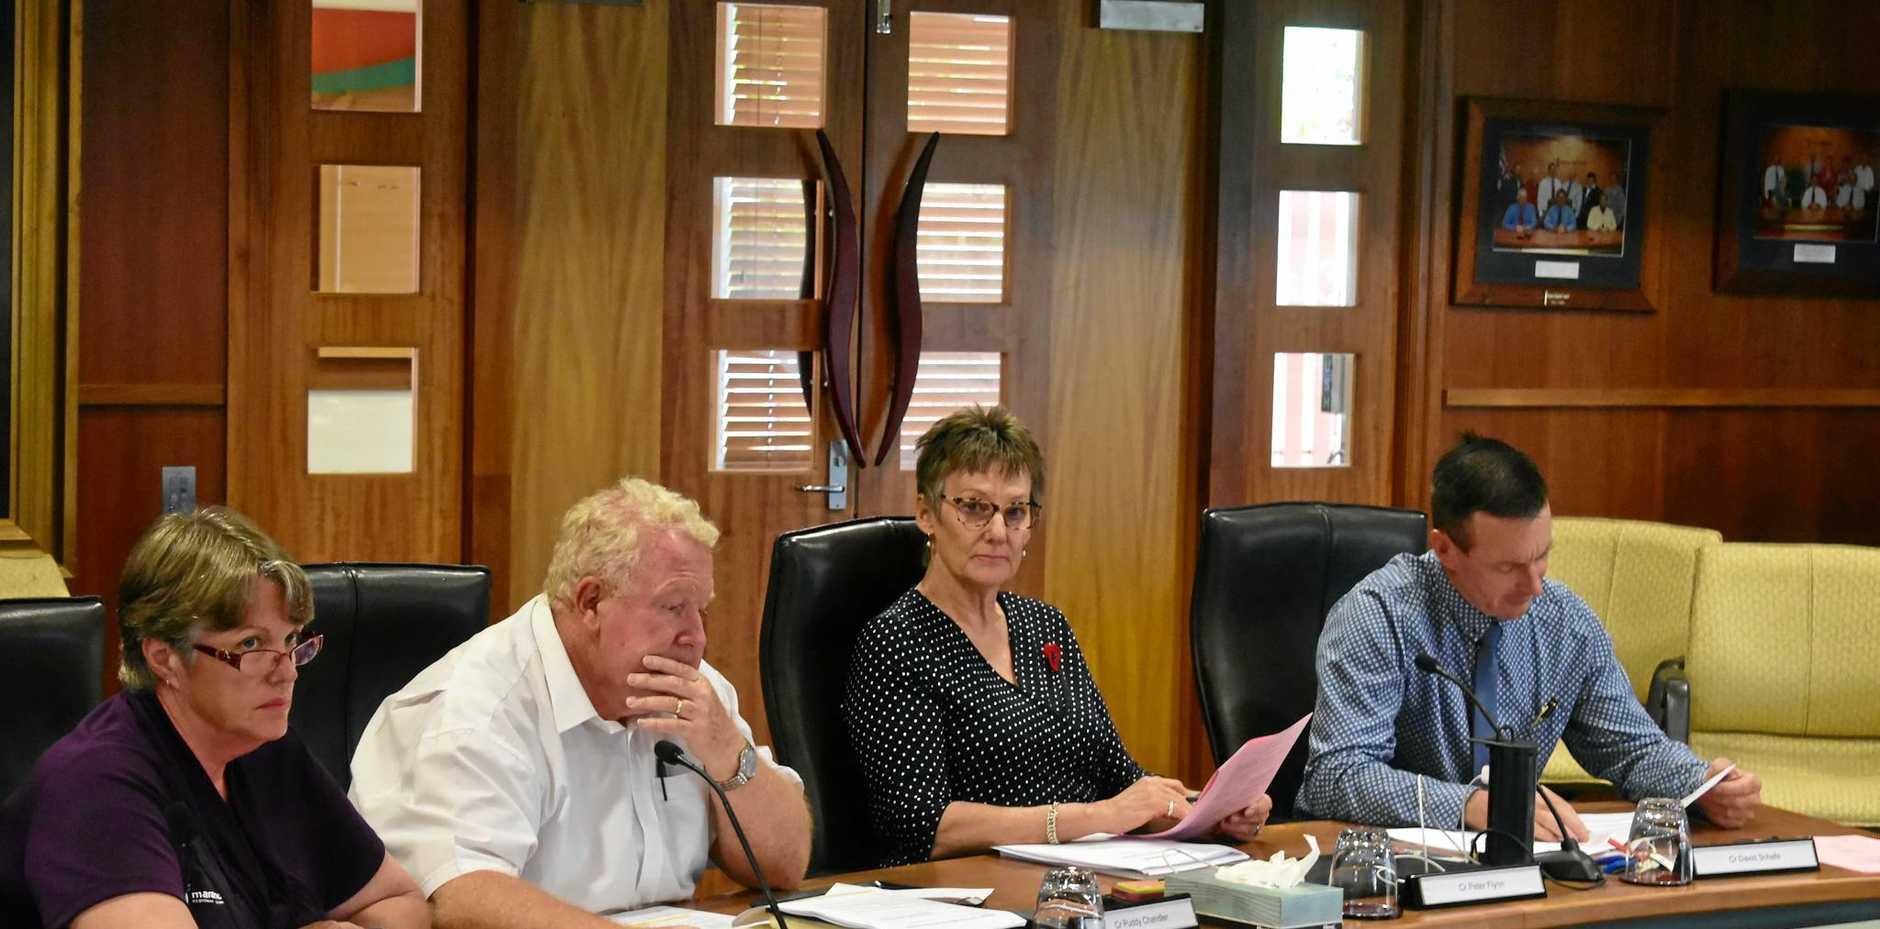 Deputy Mayor Jan Chambers, Cr Peter Flynn, Cr Puddy Chambers and Cr David Schefe.